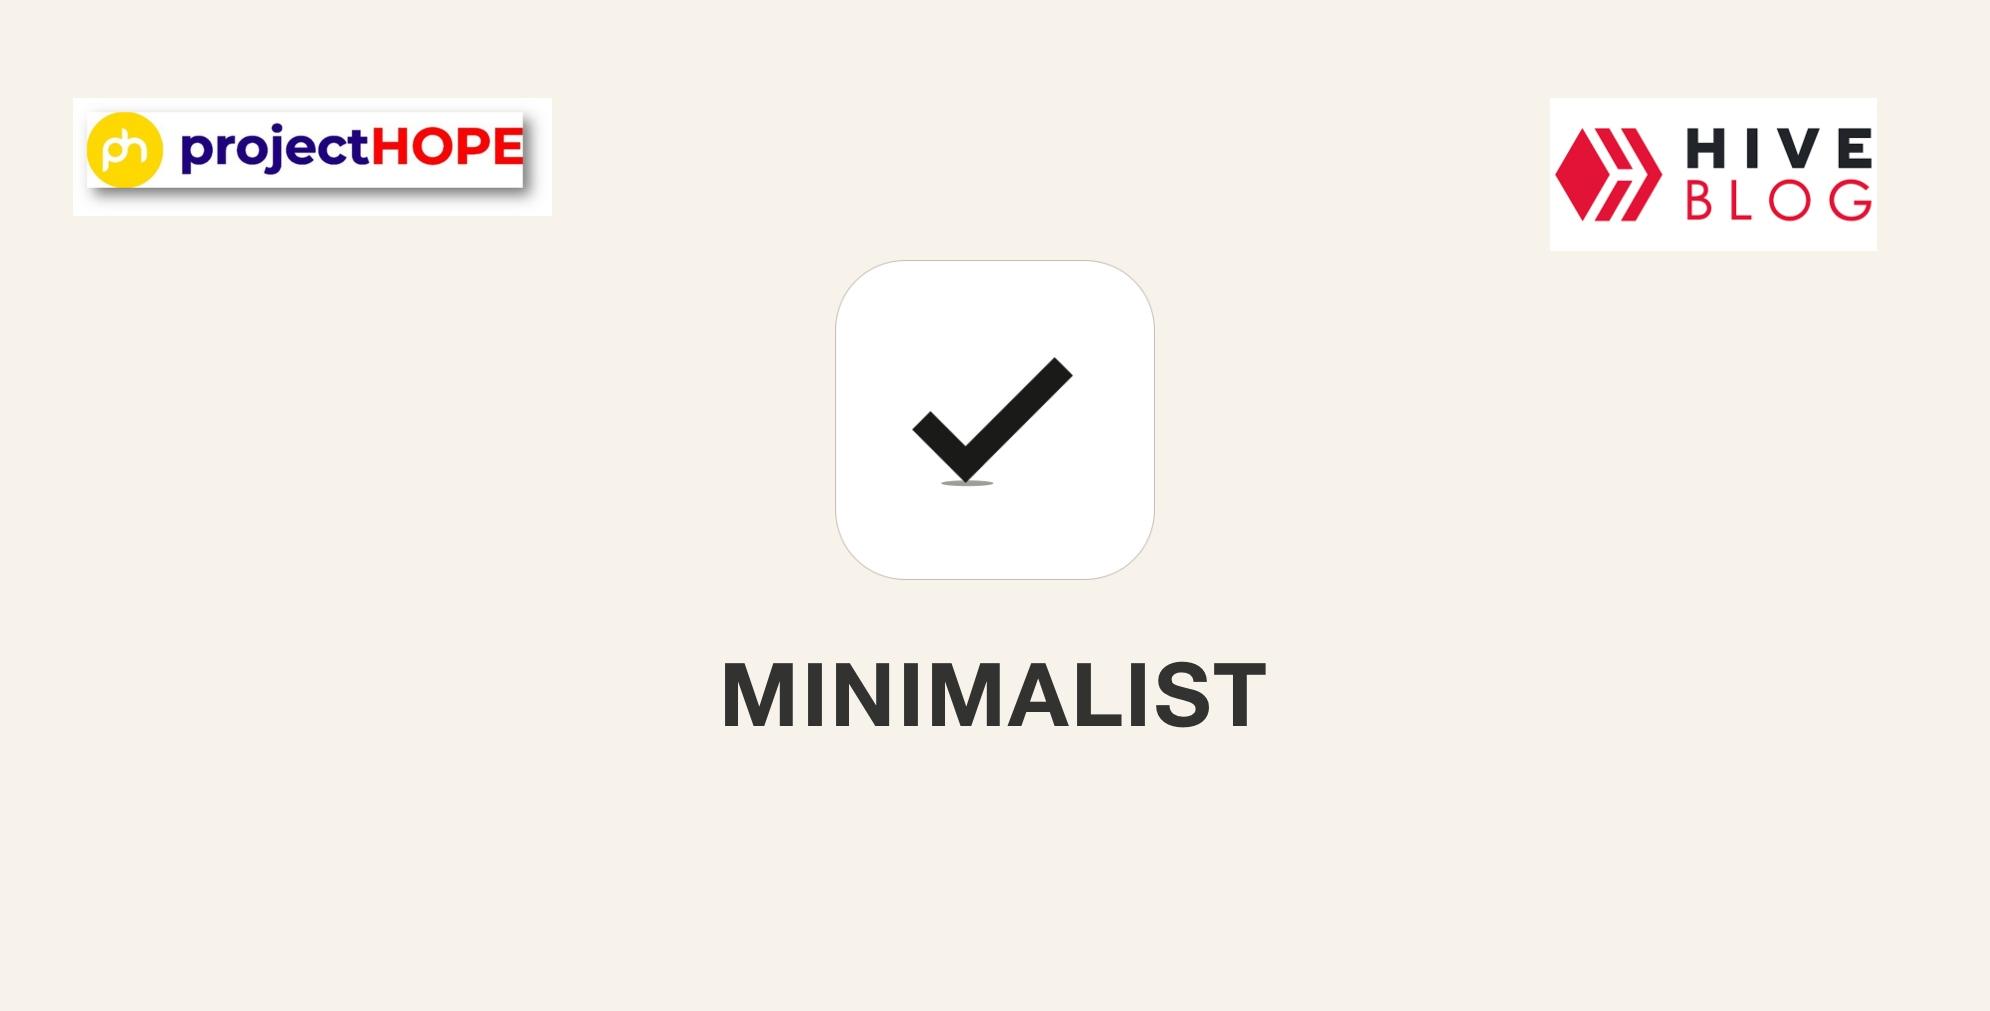 xcrmorg_minimalist_logo2.png.pagespeed.ic.t1B-4cW_uDrqwrwerwedgsdgsd.jpg